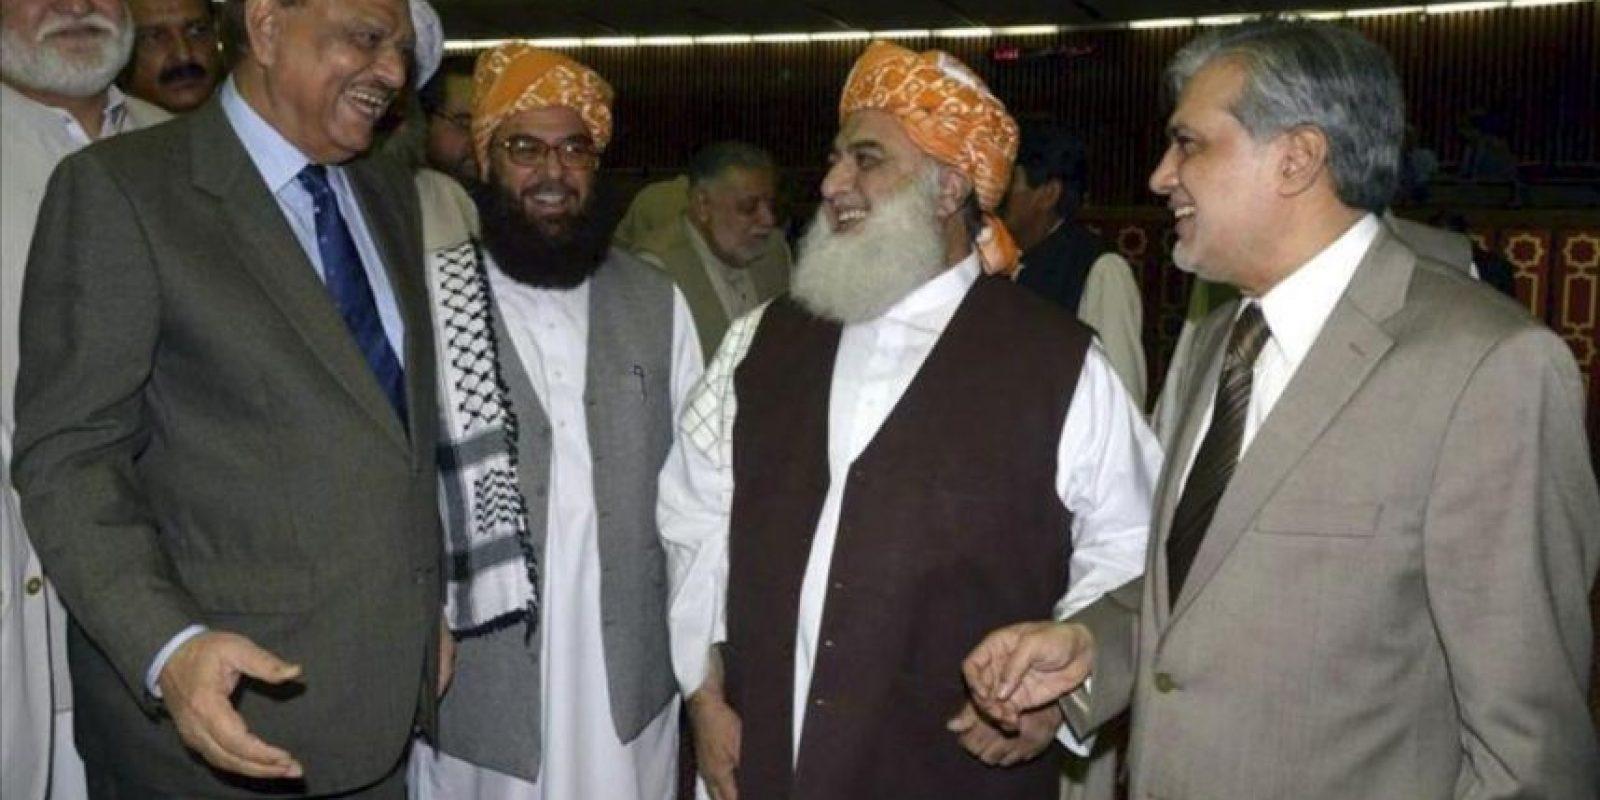 El presidente Manmún Husein (izda) conversa con el líder del partido Jamiat Ulema Islam, Maulana Fazalur Rehman (2ºdcha) en Islamabad (Pakistán). EFE